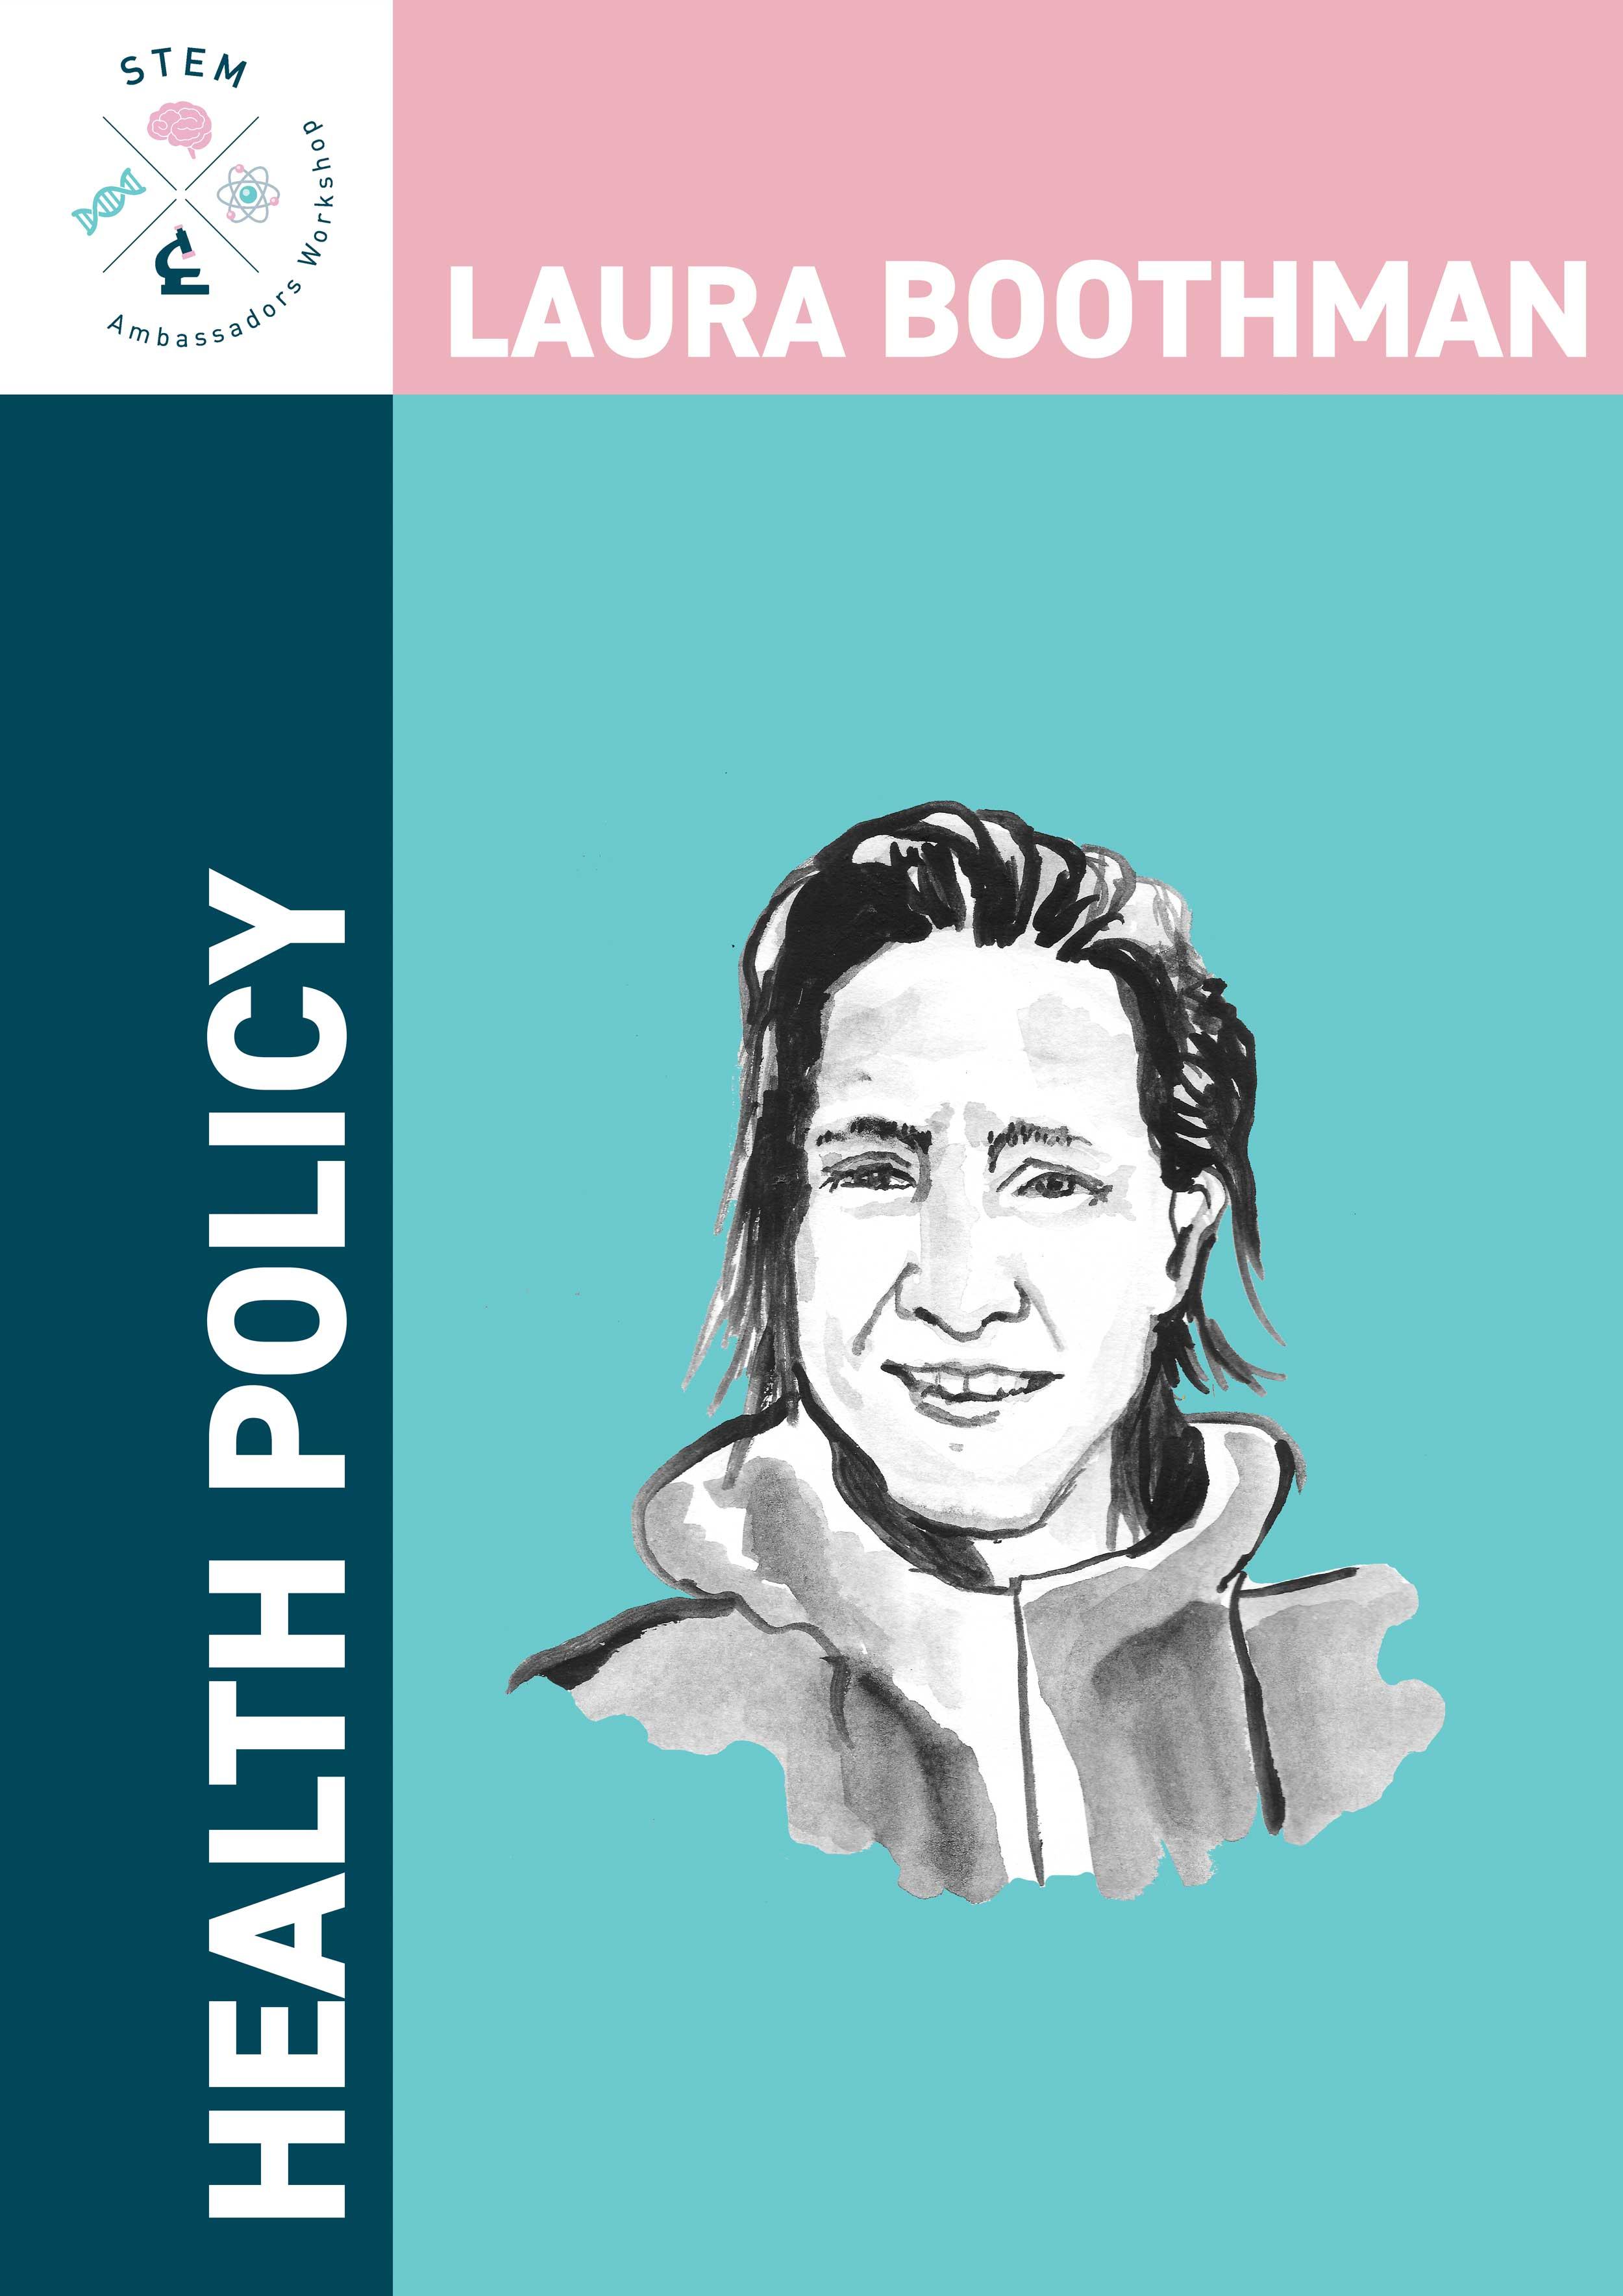 Laura Boothman